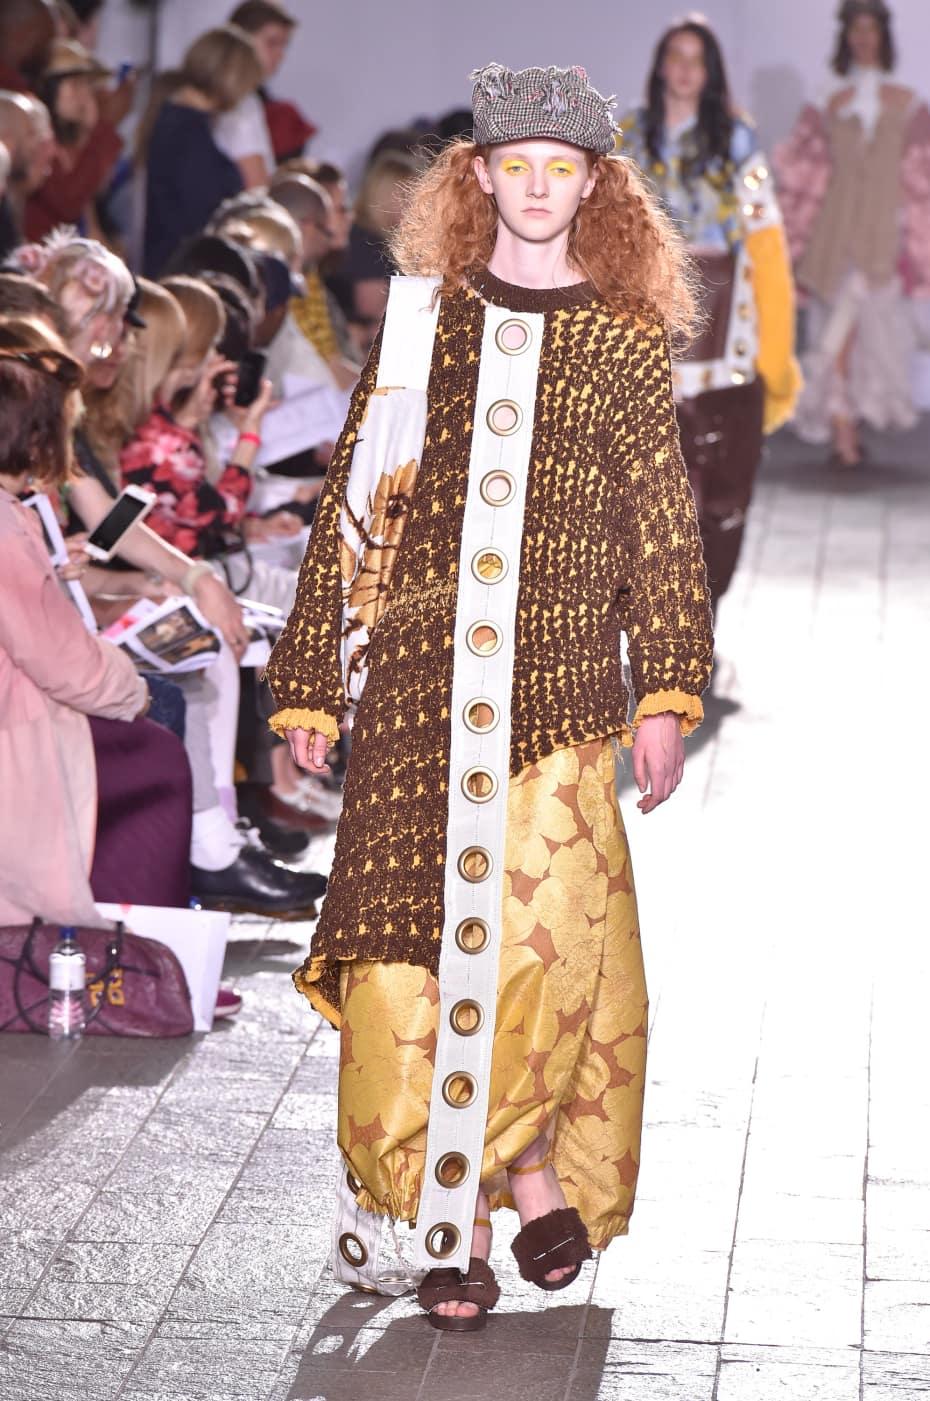 BA (Hons) Fashion: Fashion Design With Knitwear